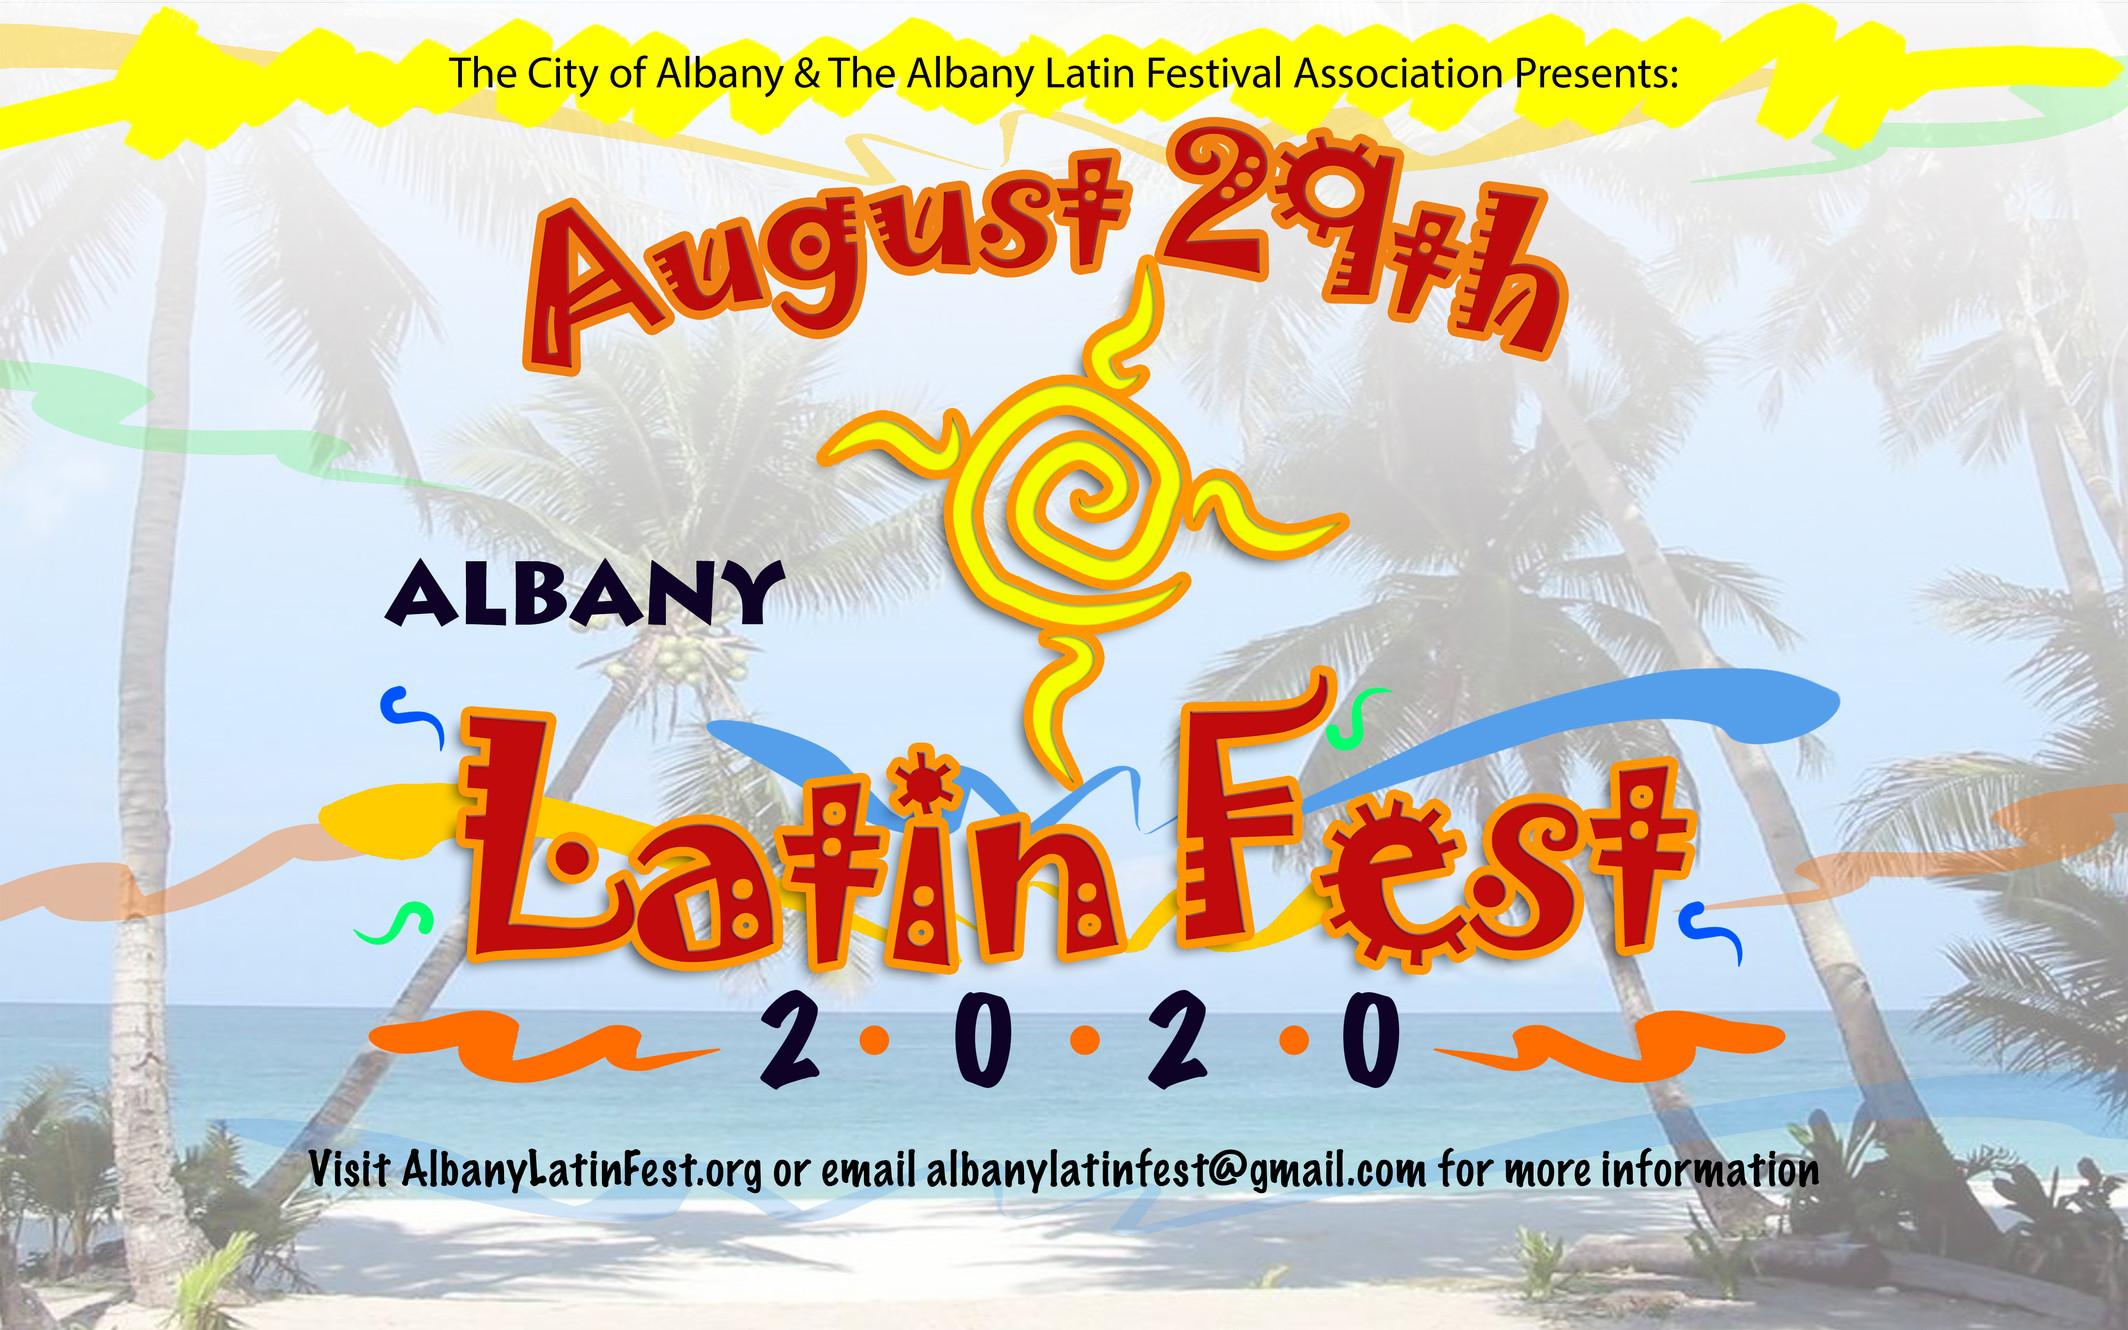 (c) Albanylatinfest.org